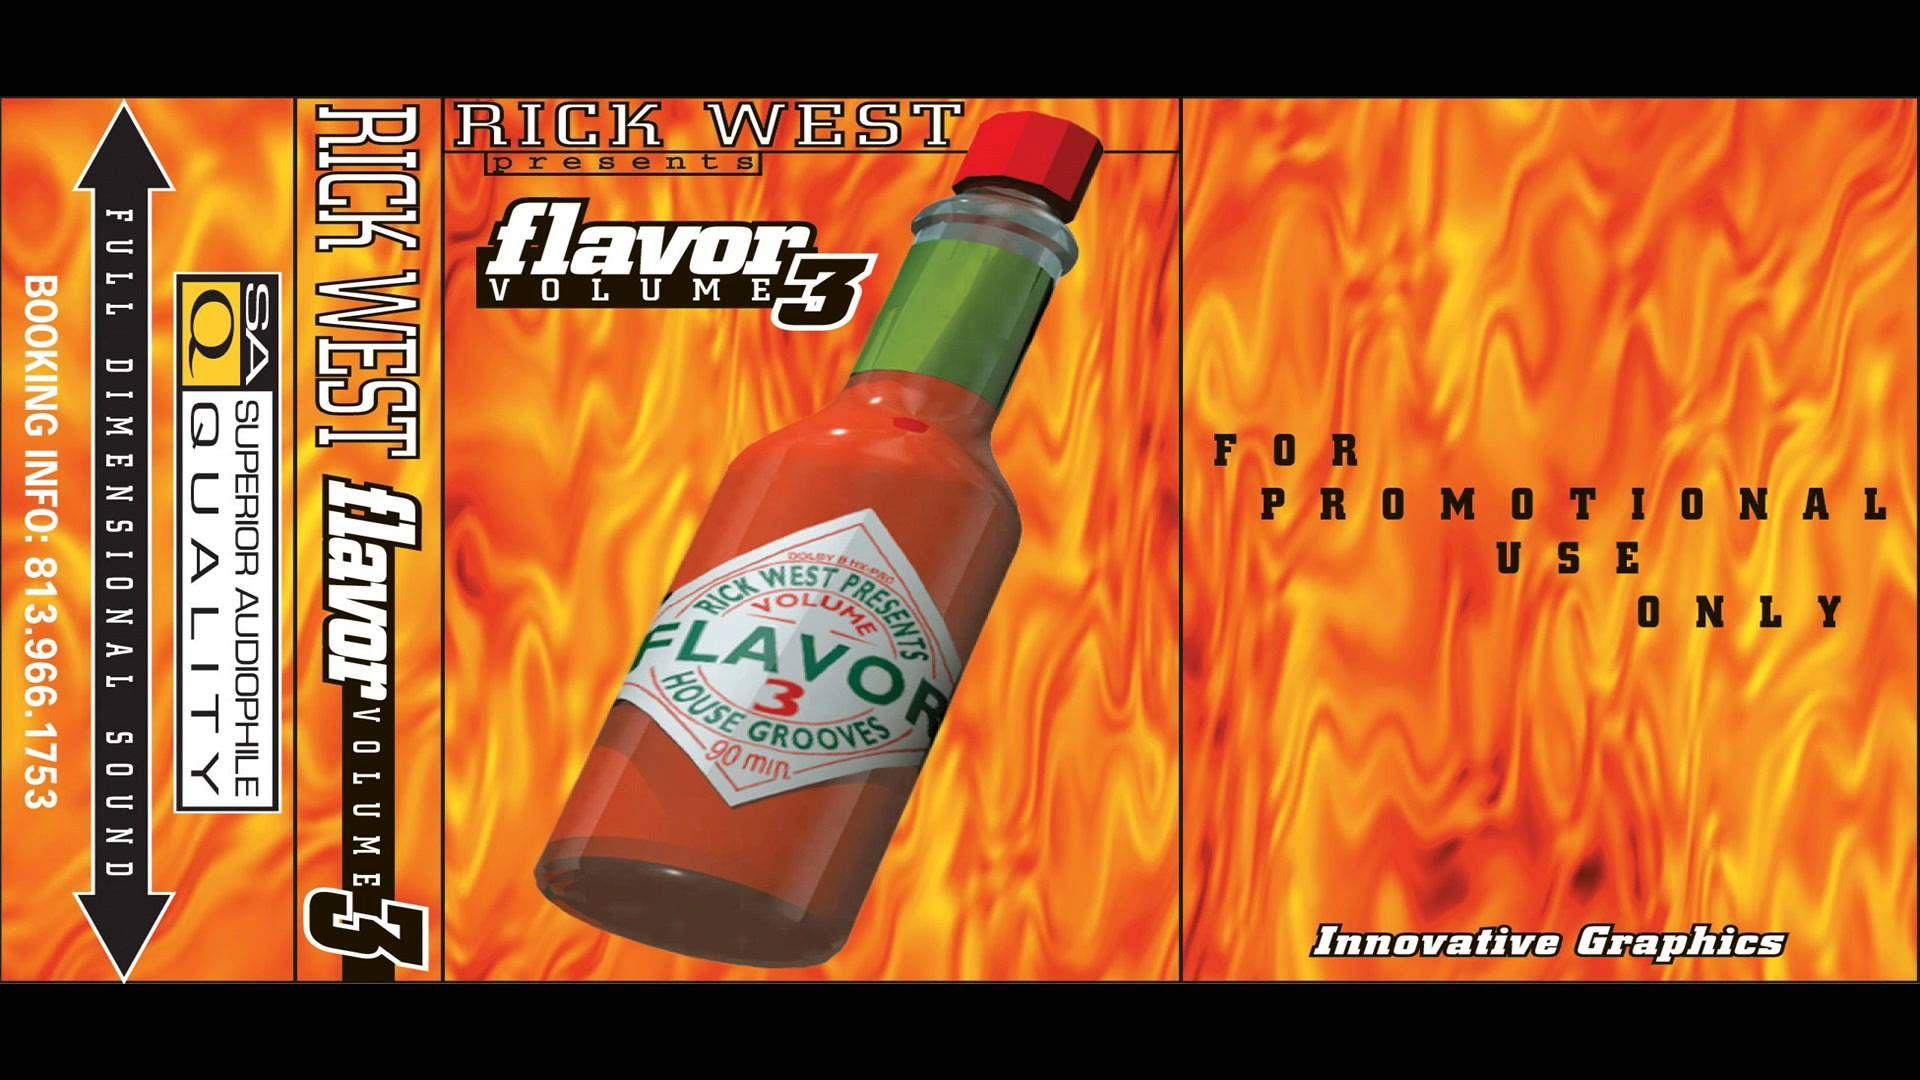 Rick West Flavor Vol.3 Mixtape Series Side A & B (Spring 1996)